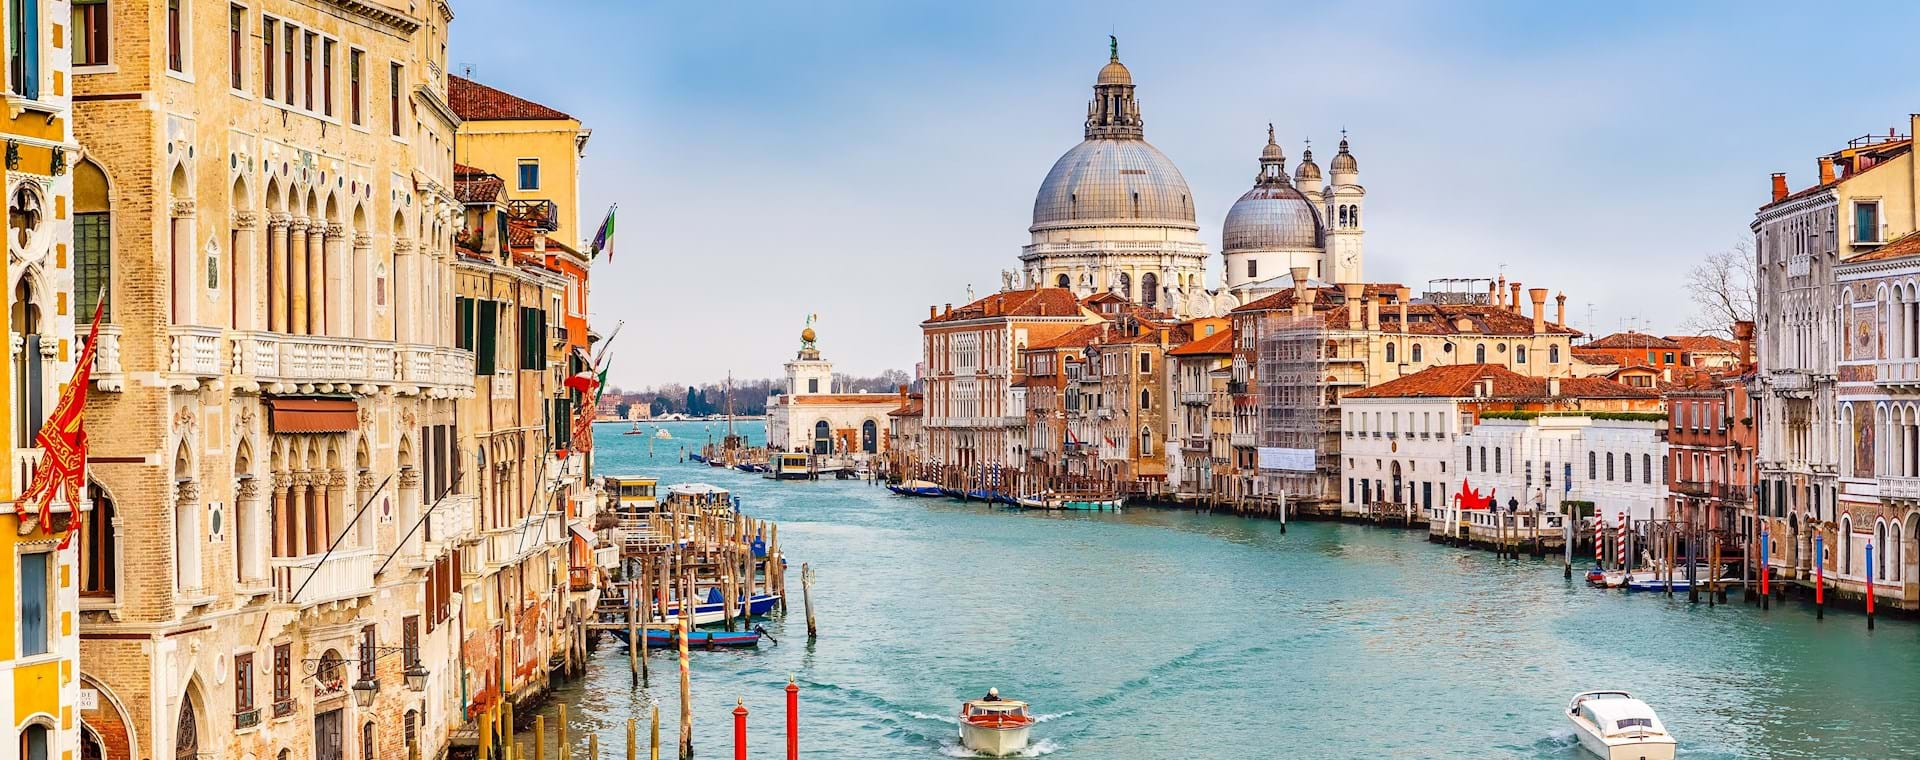 Best of Venice Tour with St. Mark's Basilica & Terraces & Gondola Ride